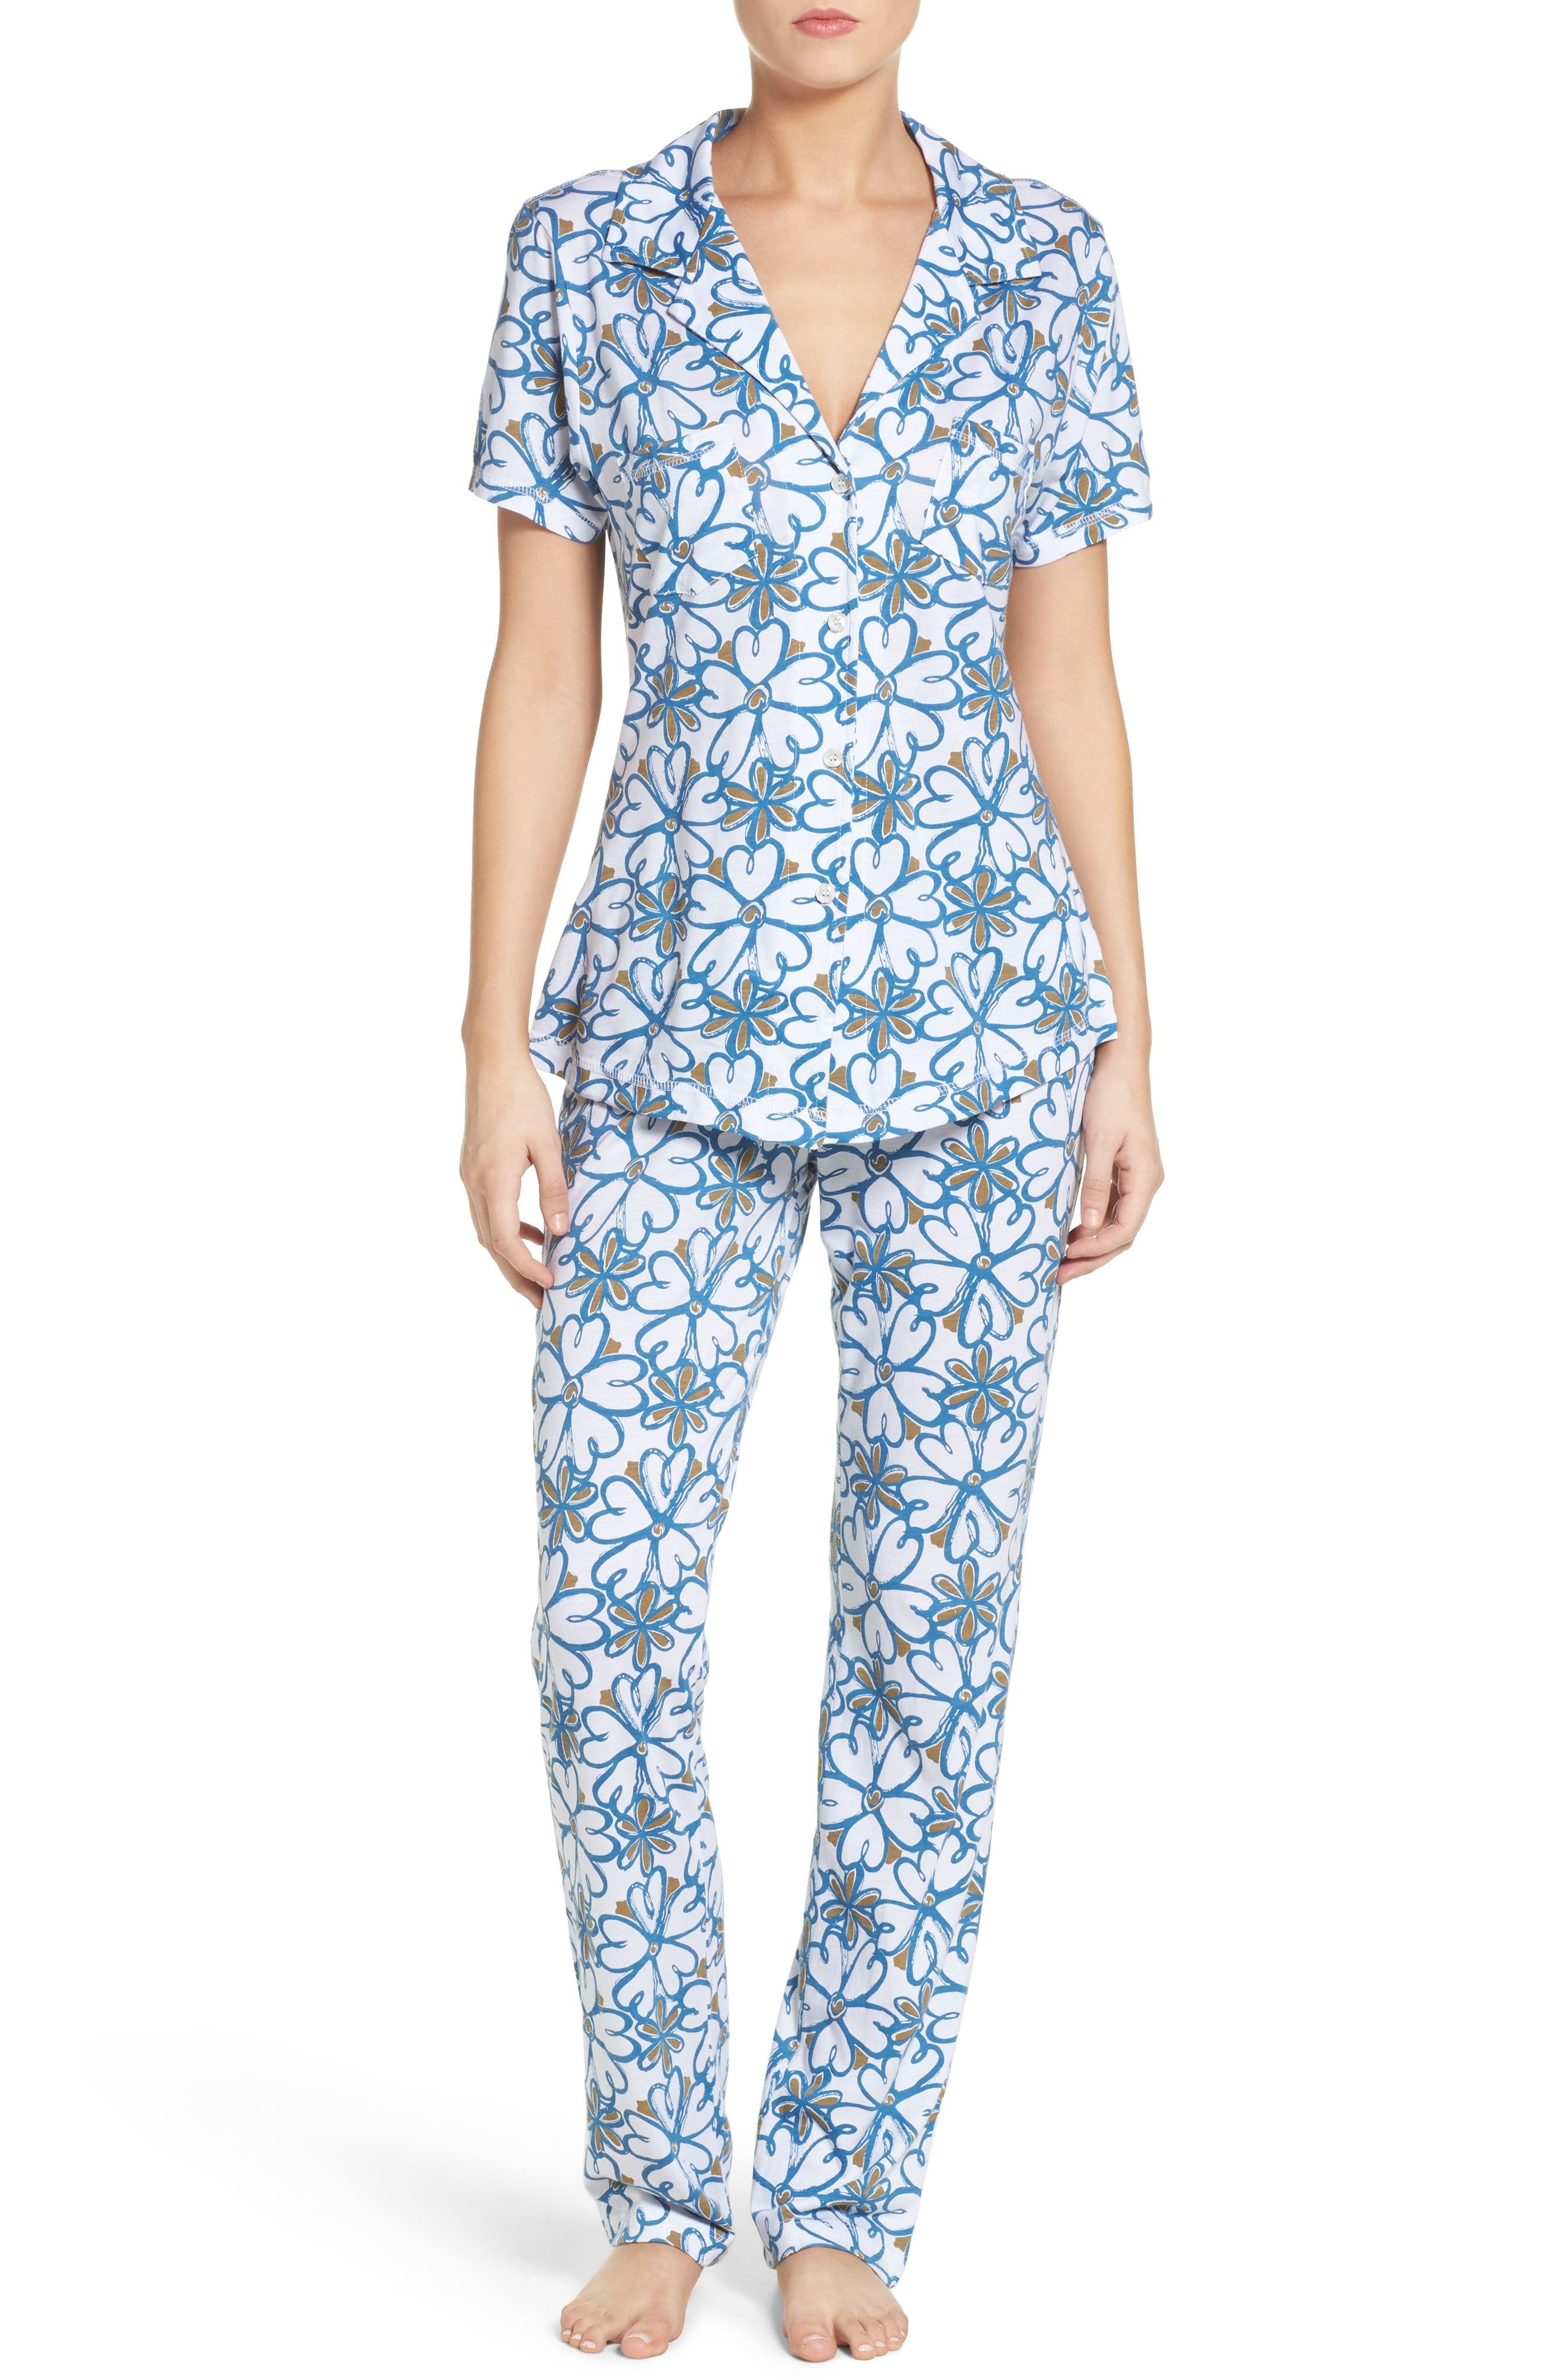 LOVE+GRACE Bloominglove Pajamas